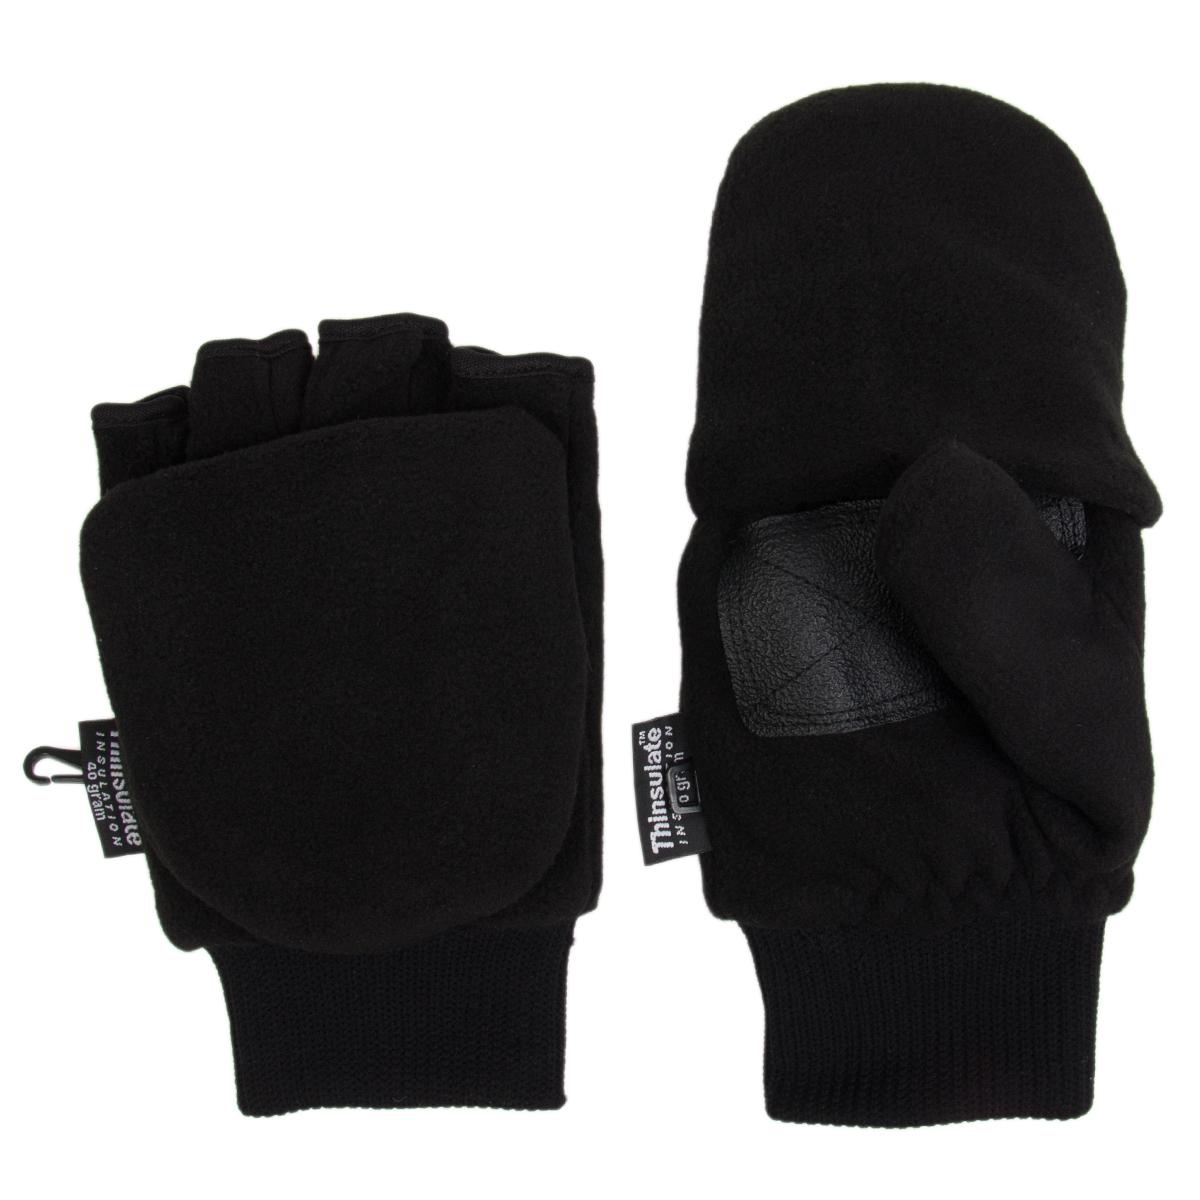 The Manzella Men's Cascade Convertible Fleece Gloves are a heavyweight fleece convertible mitten/glove with flip-mitt versatility for easy use with touch screen devices. Thinsulate insulation and a micro-fleece composition provide cozy warmth.